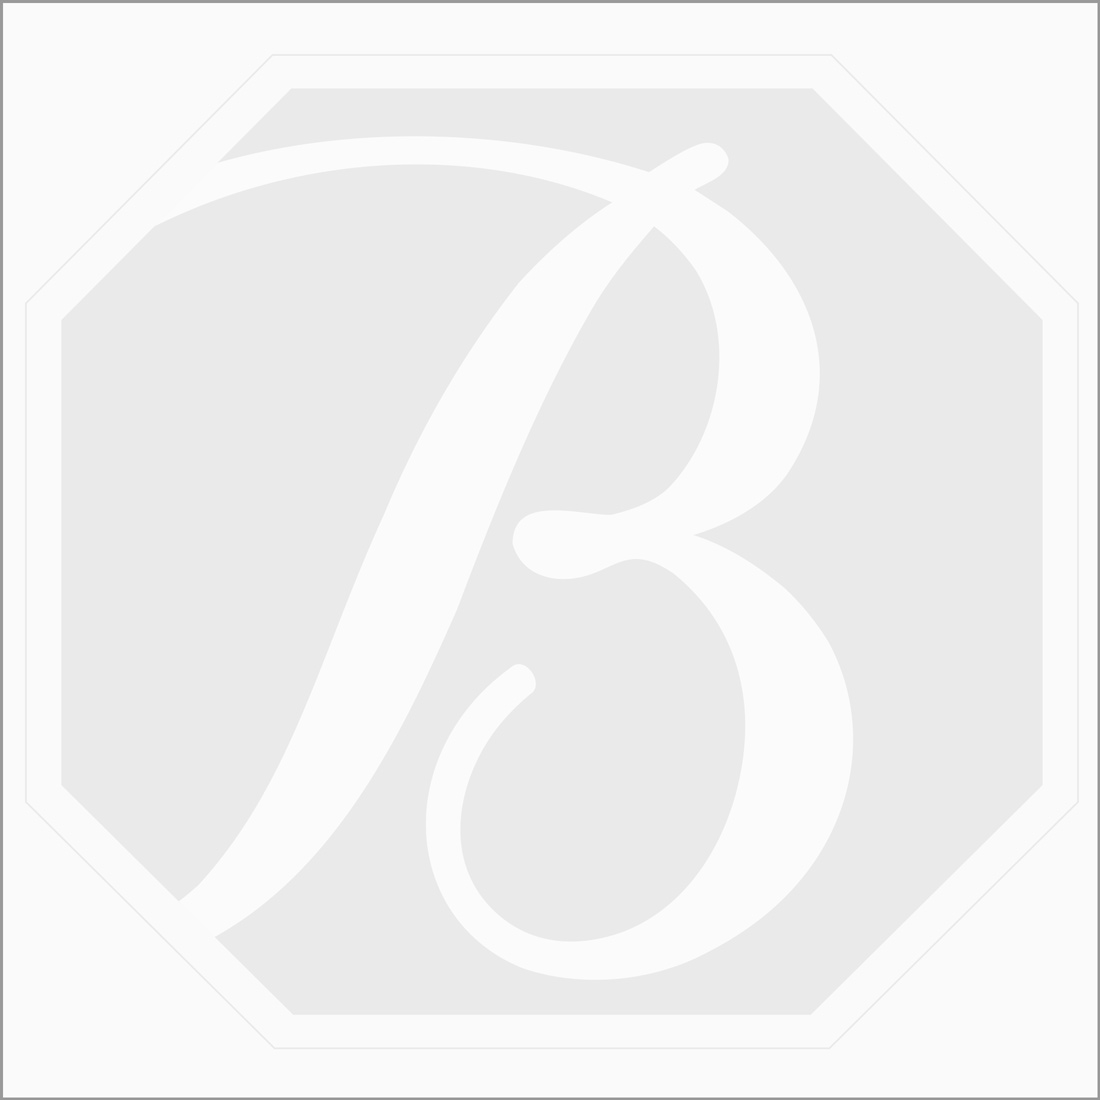 30 x 25 mm - Medium Peach Multi-Sapphire Oval Shape Carving - 1 piece - 79.00 carats (MSCar1040)